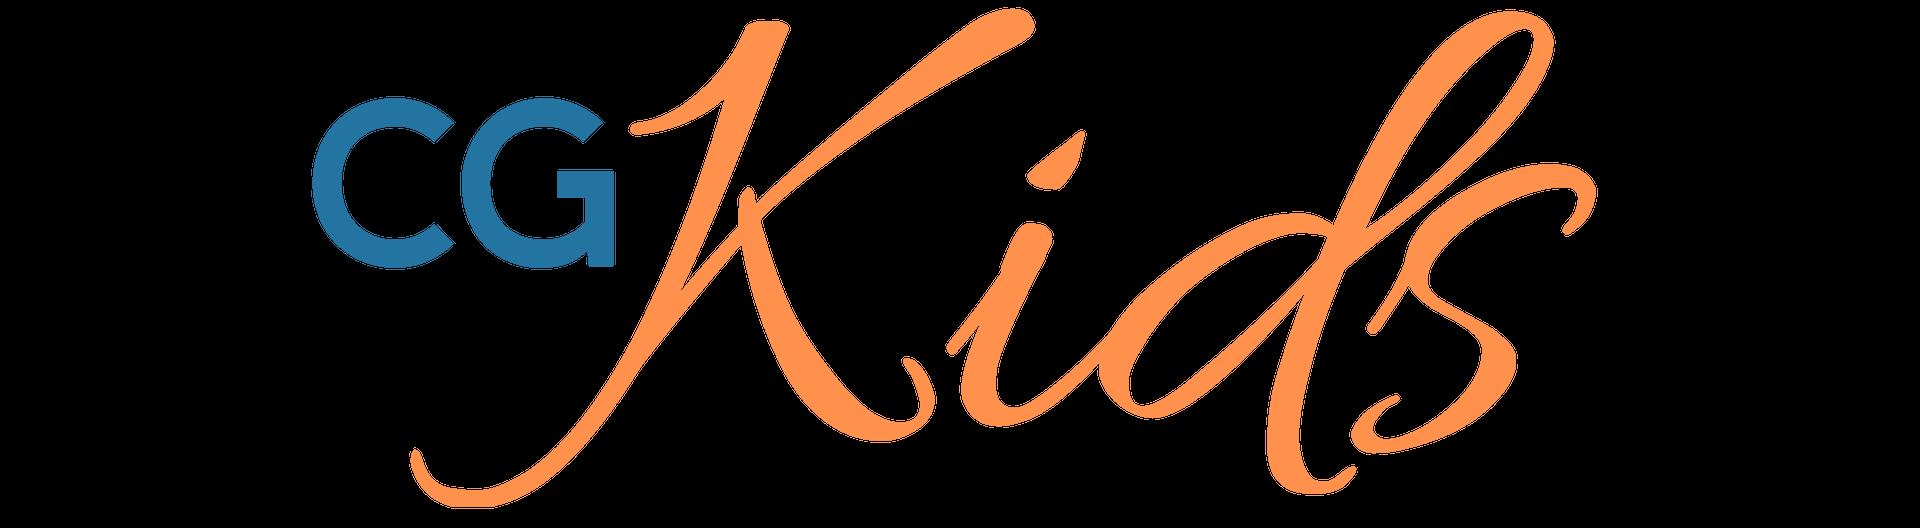 CG Kids (8).png